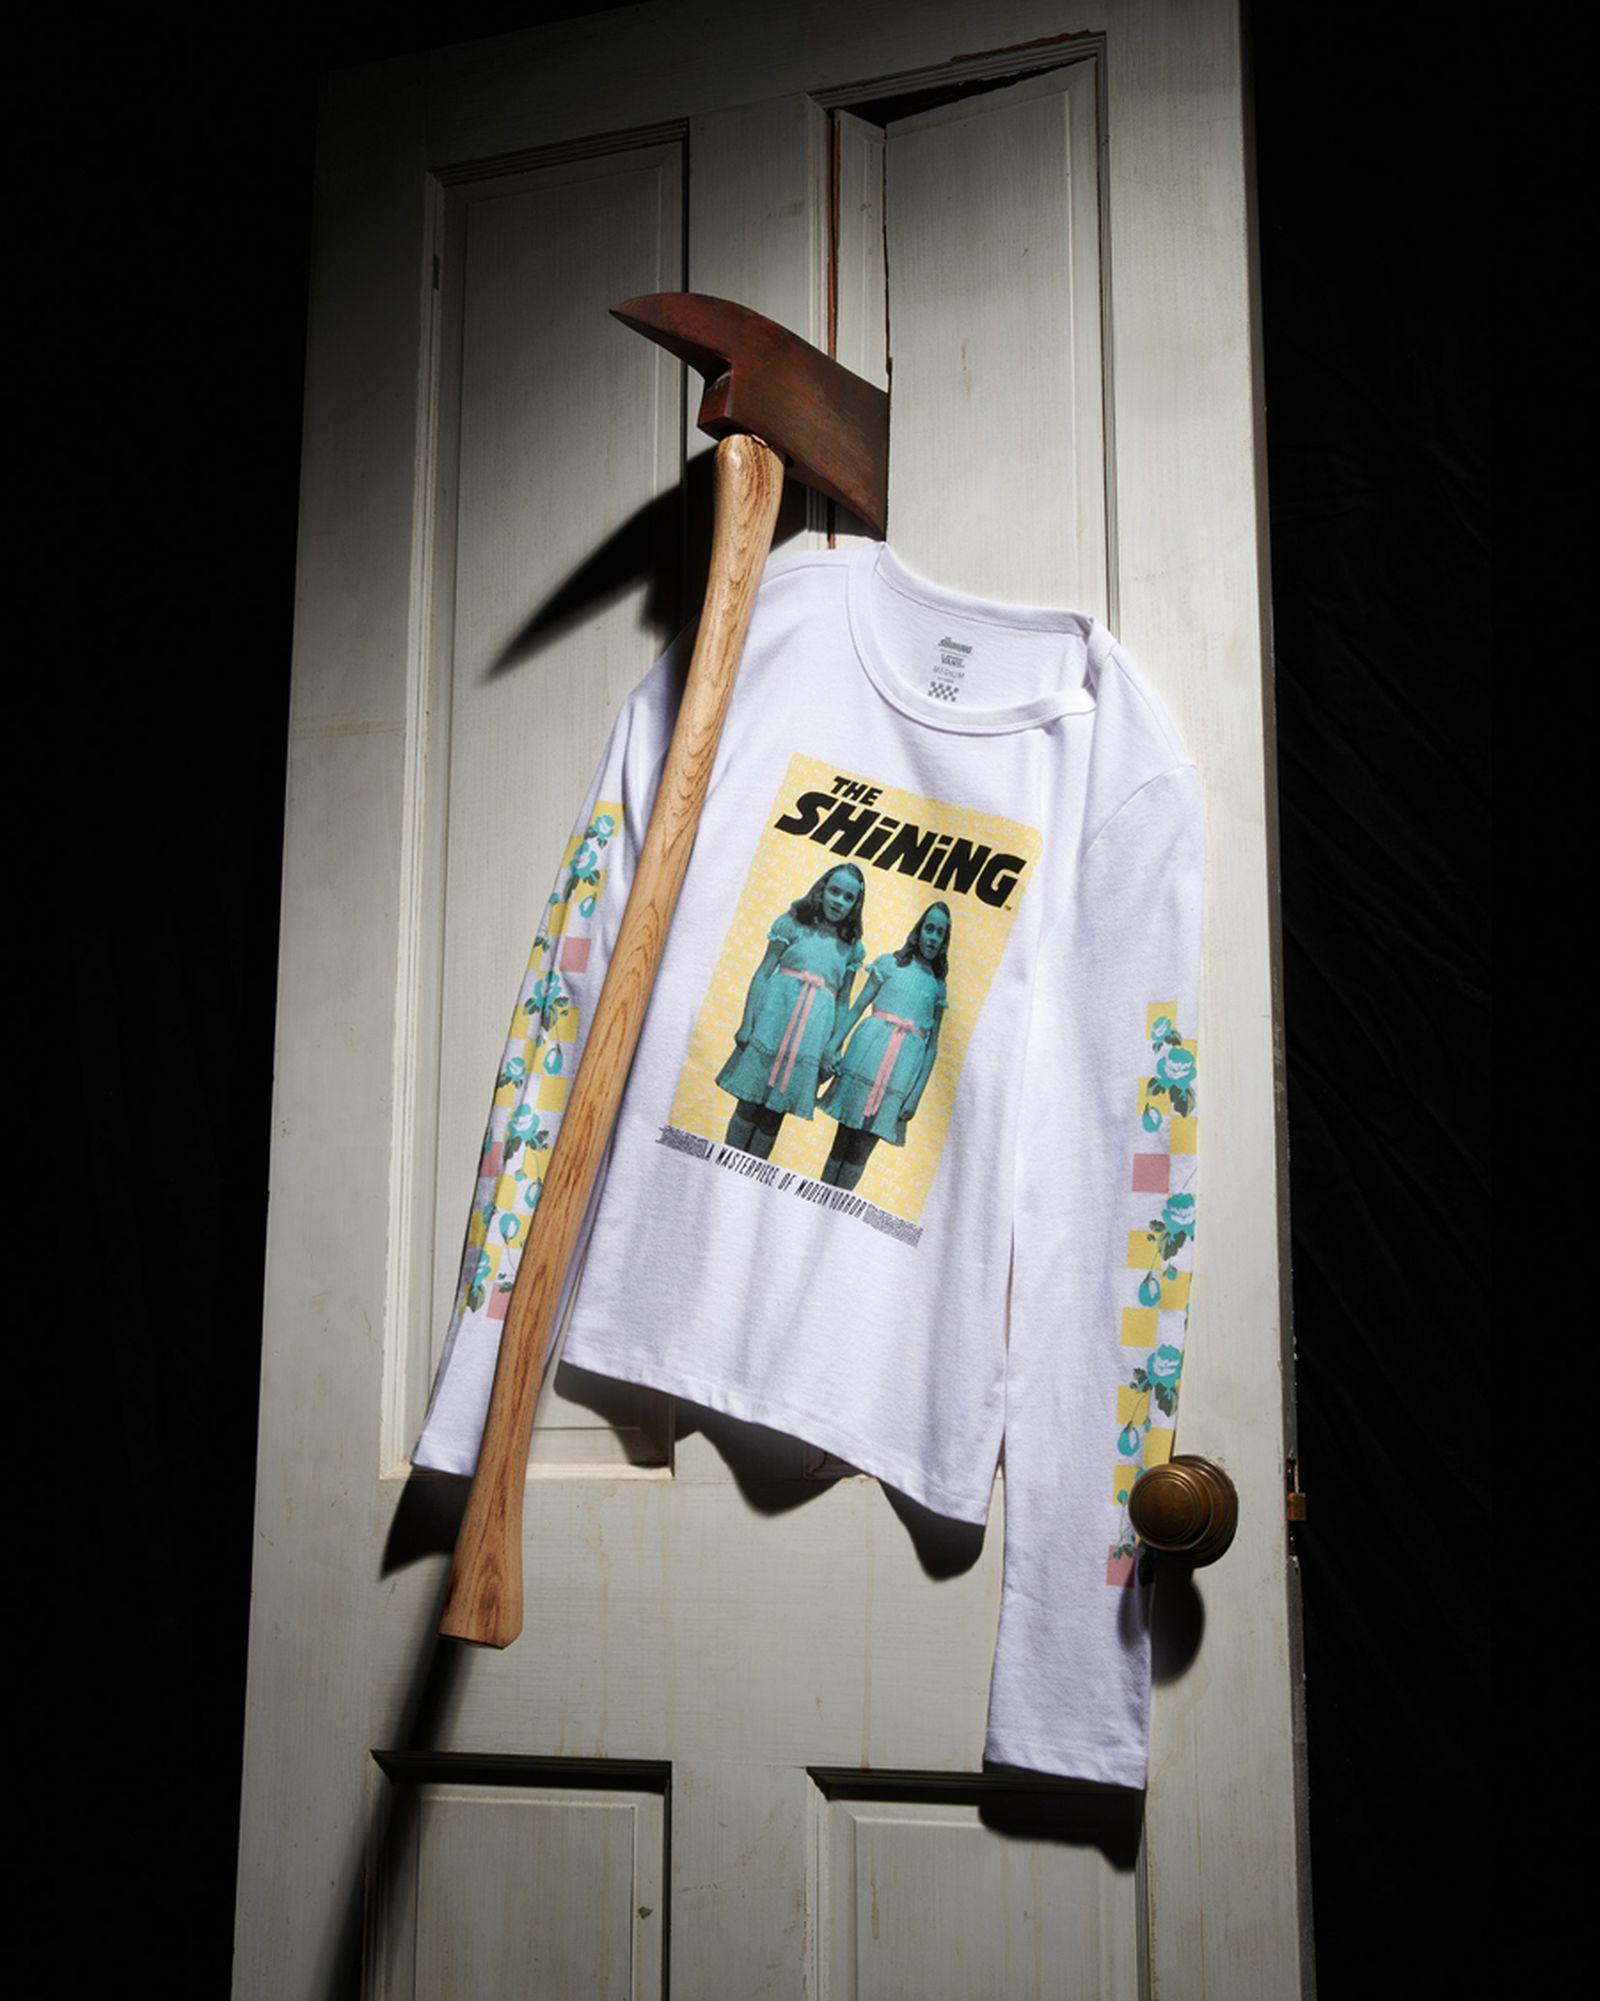 vans horror collection sneakers jason voorhees shining twins it pennywise freddy krueger release date info buy sk8 hi authentic slip on it lost boys